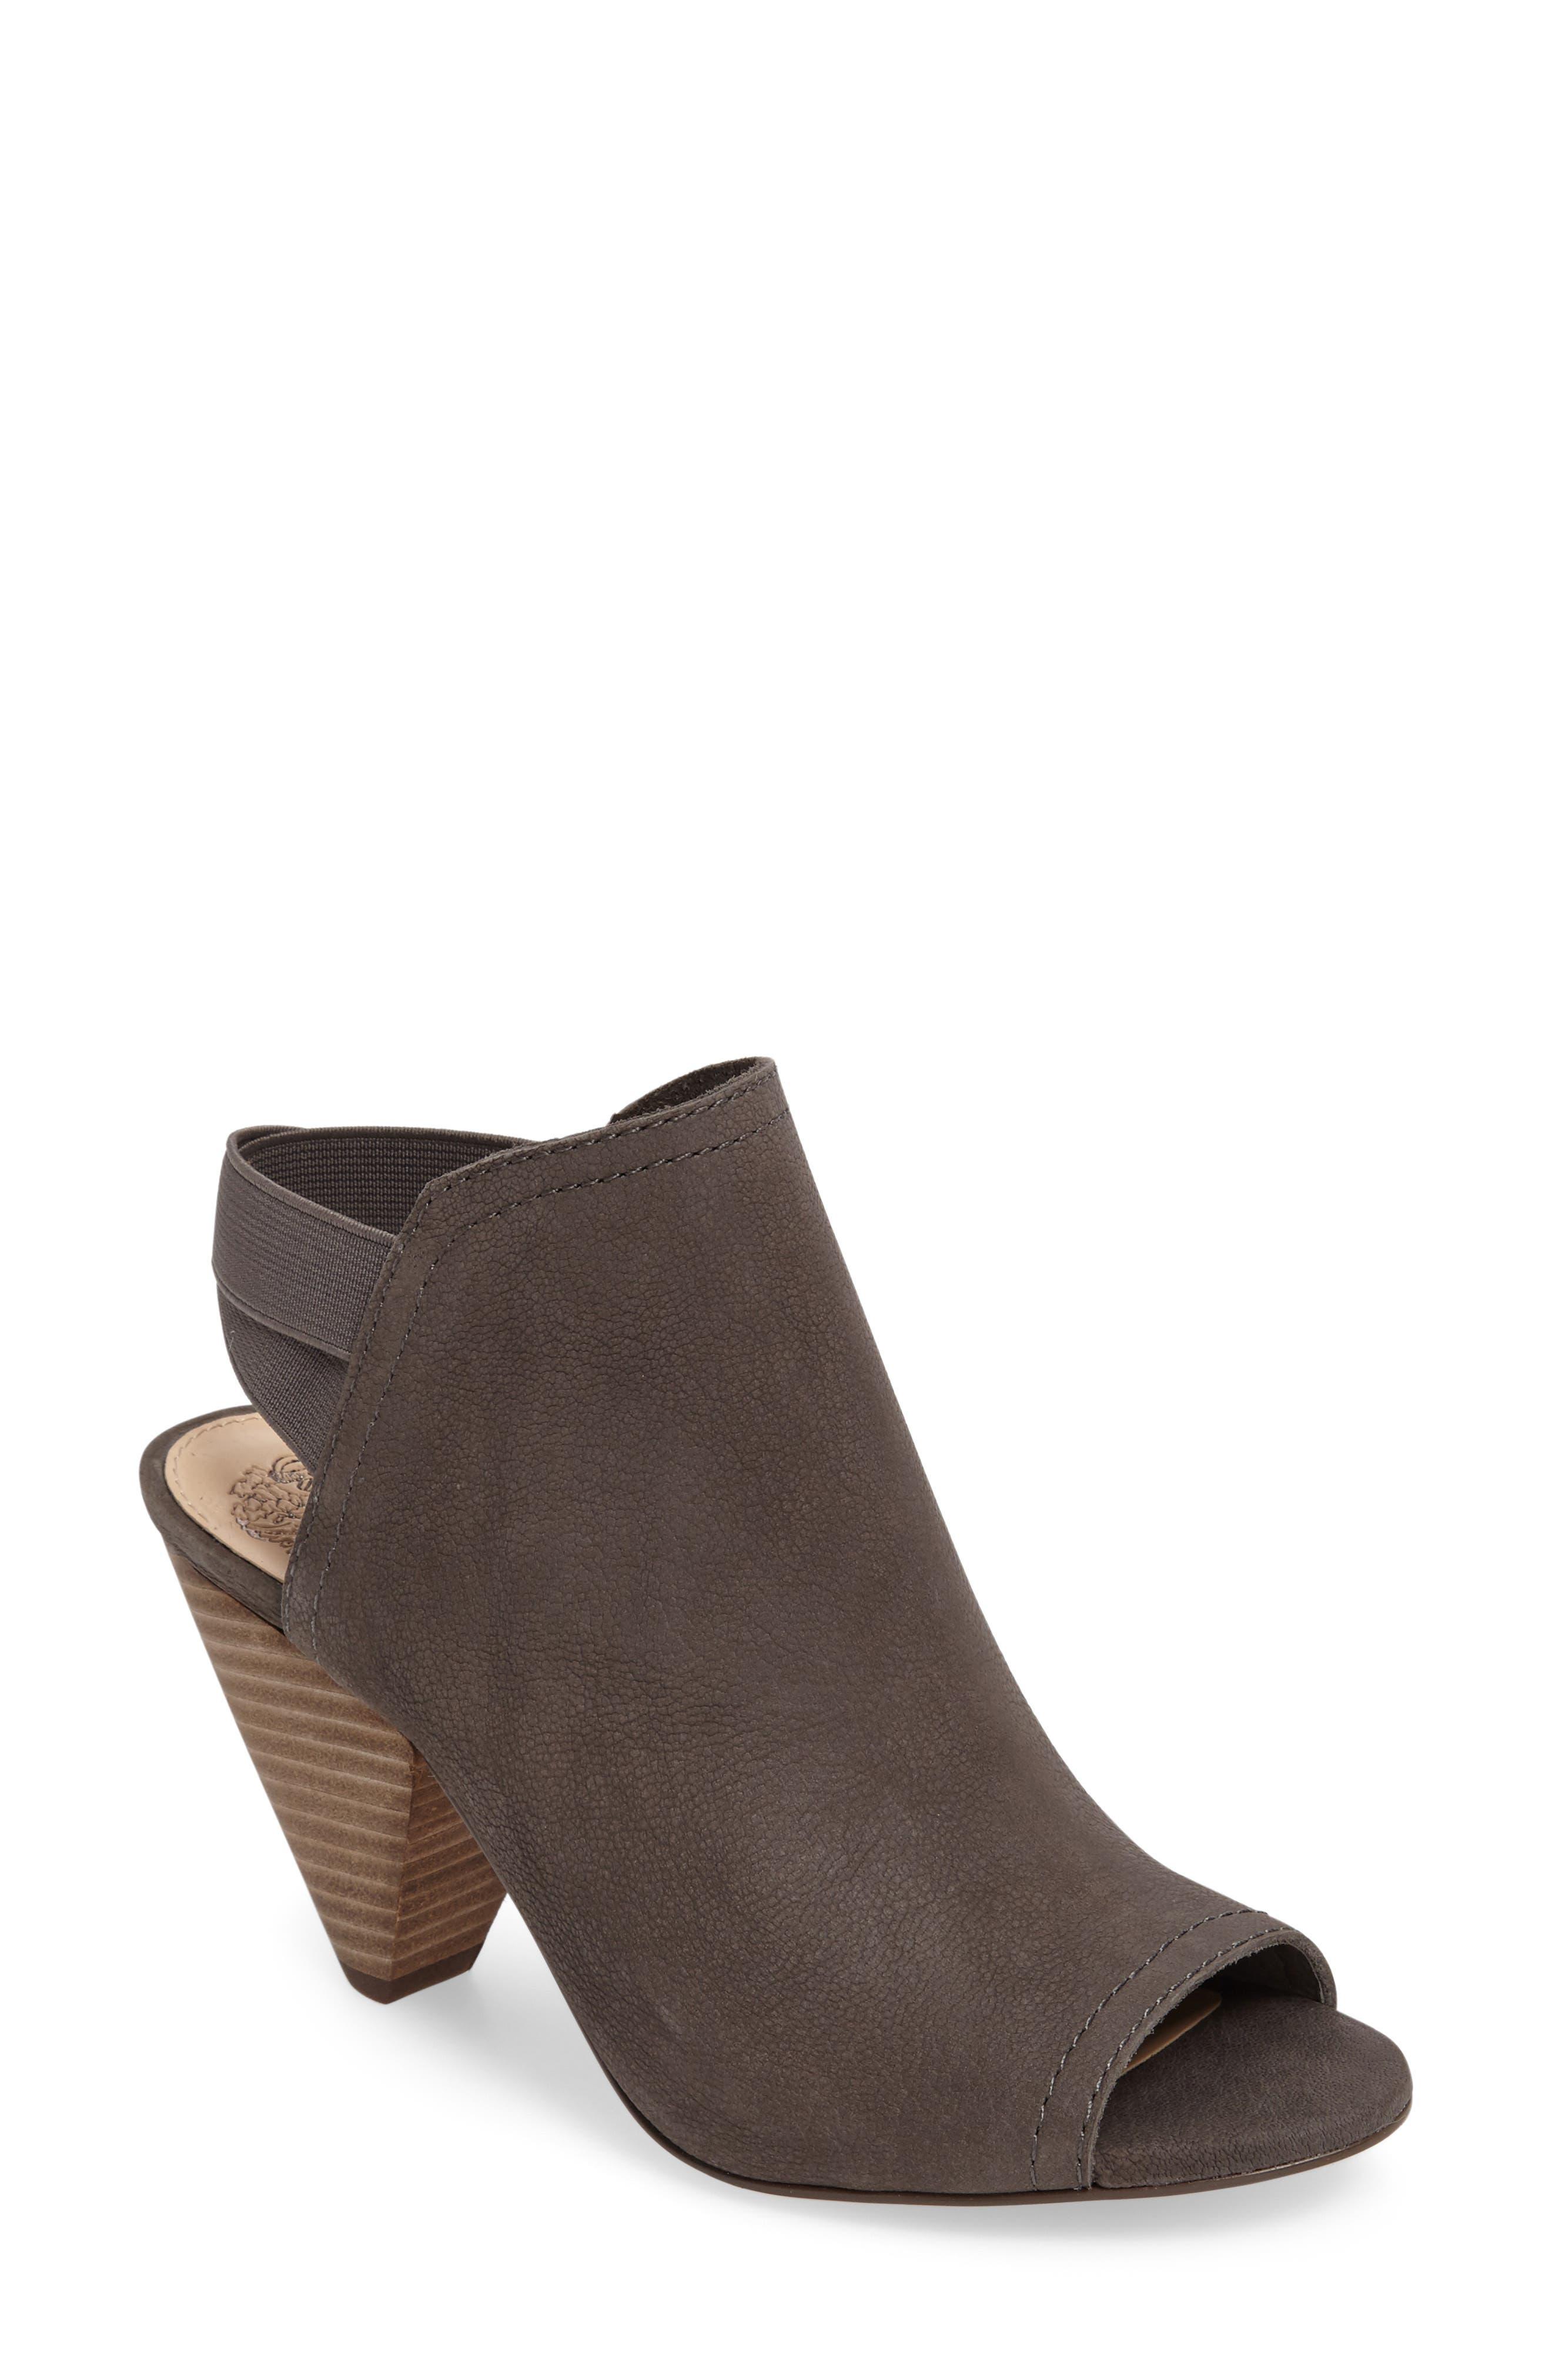 Alternate Image 1 Selected - Vince Camuto Edora Slingback Sandal (Women)